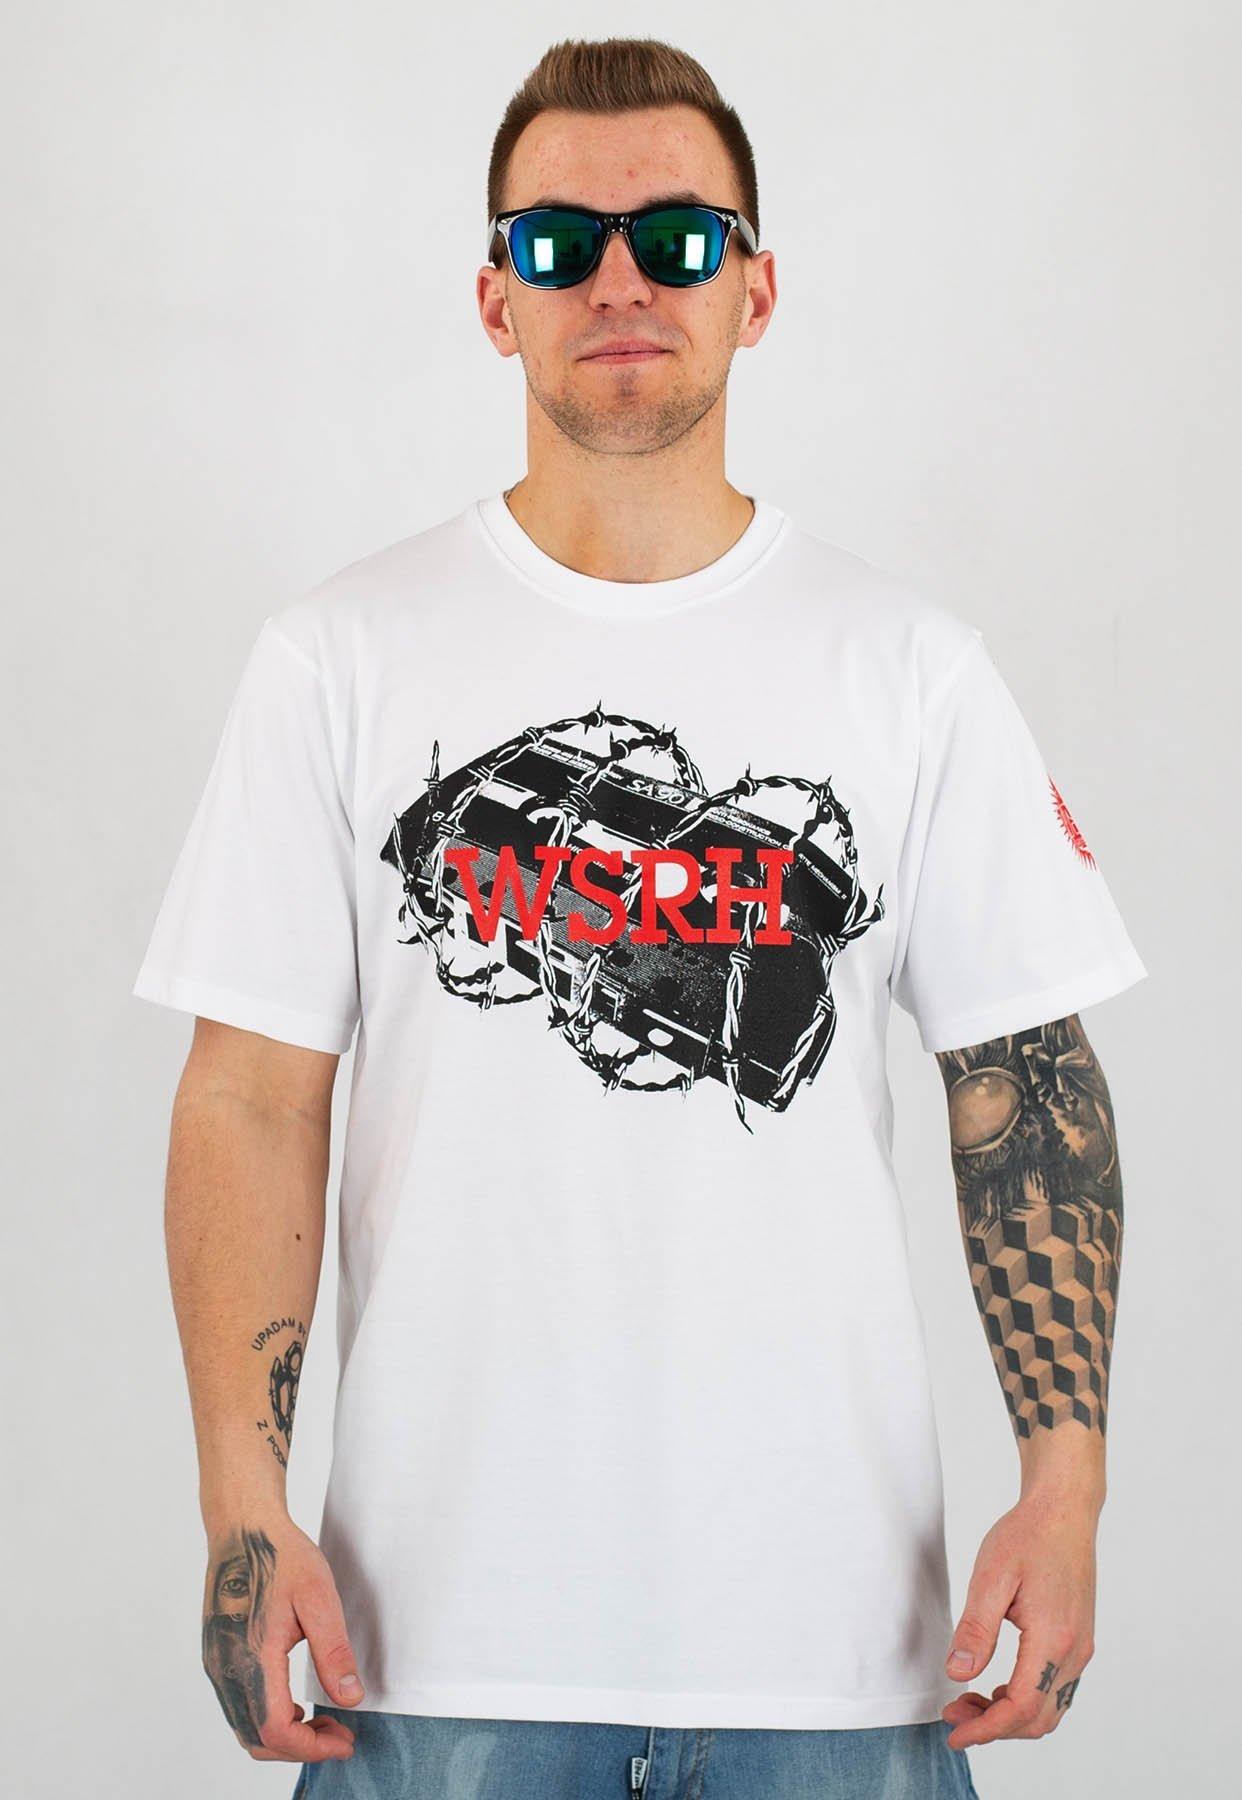 6970e5f3c T-shirt WSRH Mam To We Krwi biały